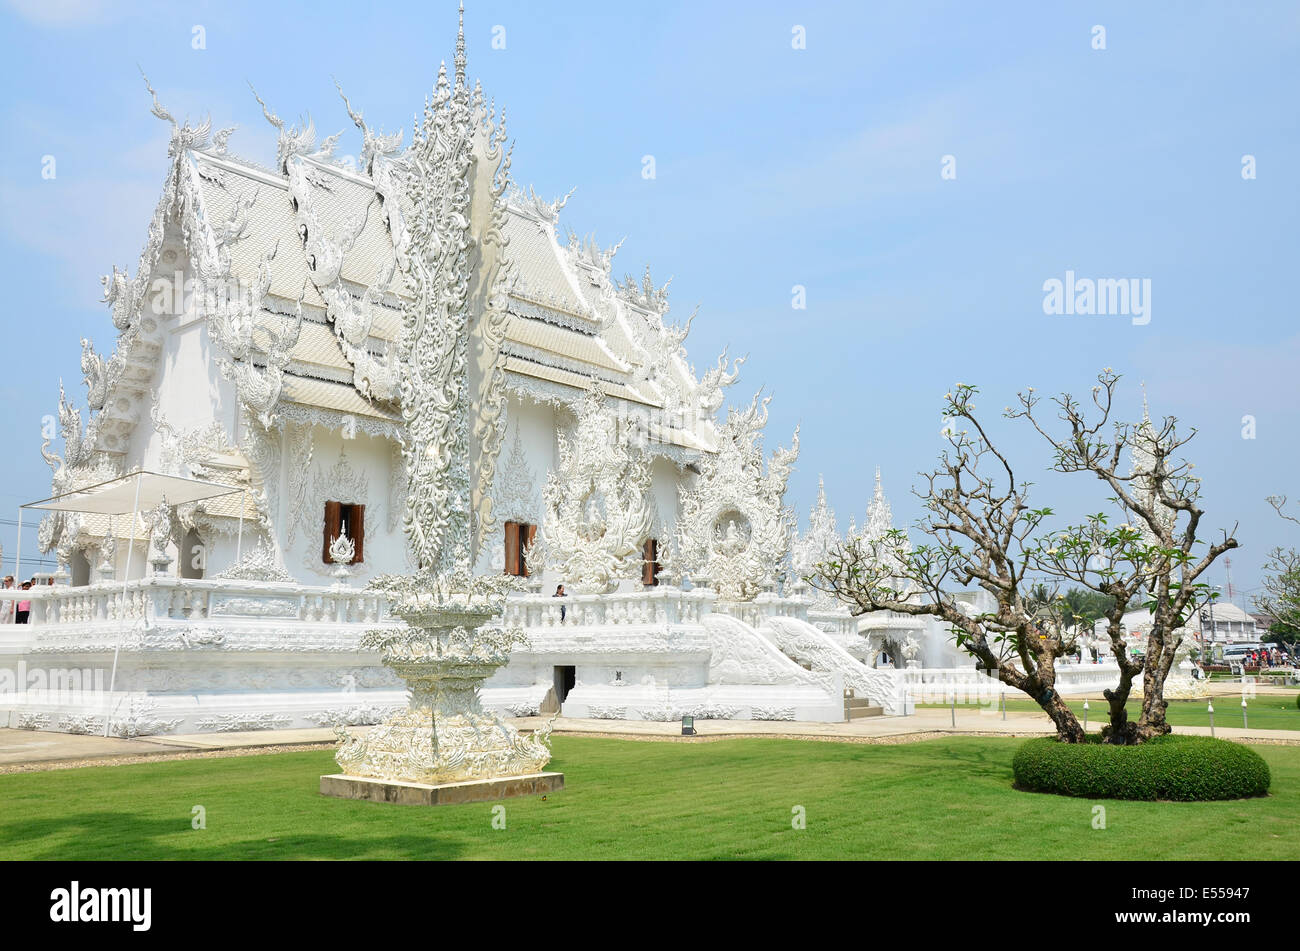 Buddhist-Hindu temple complex Wat Rong Khun, Thailand Stock Photo